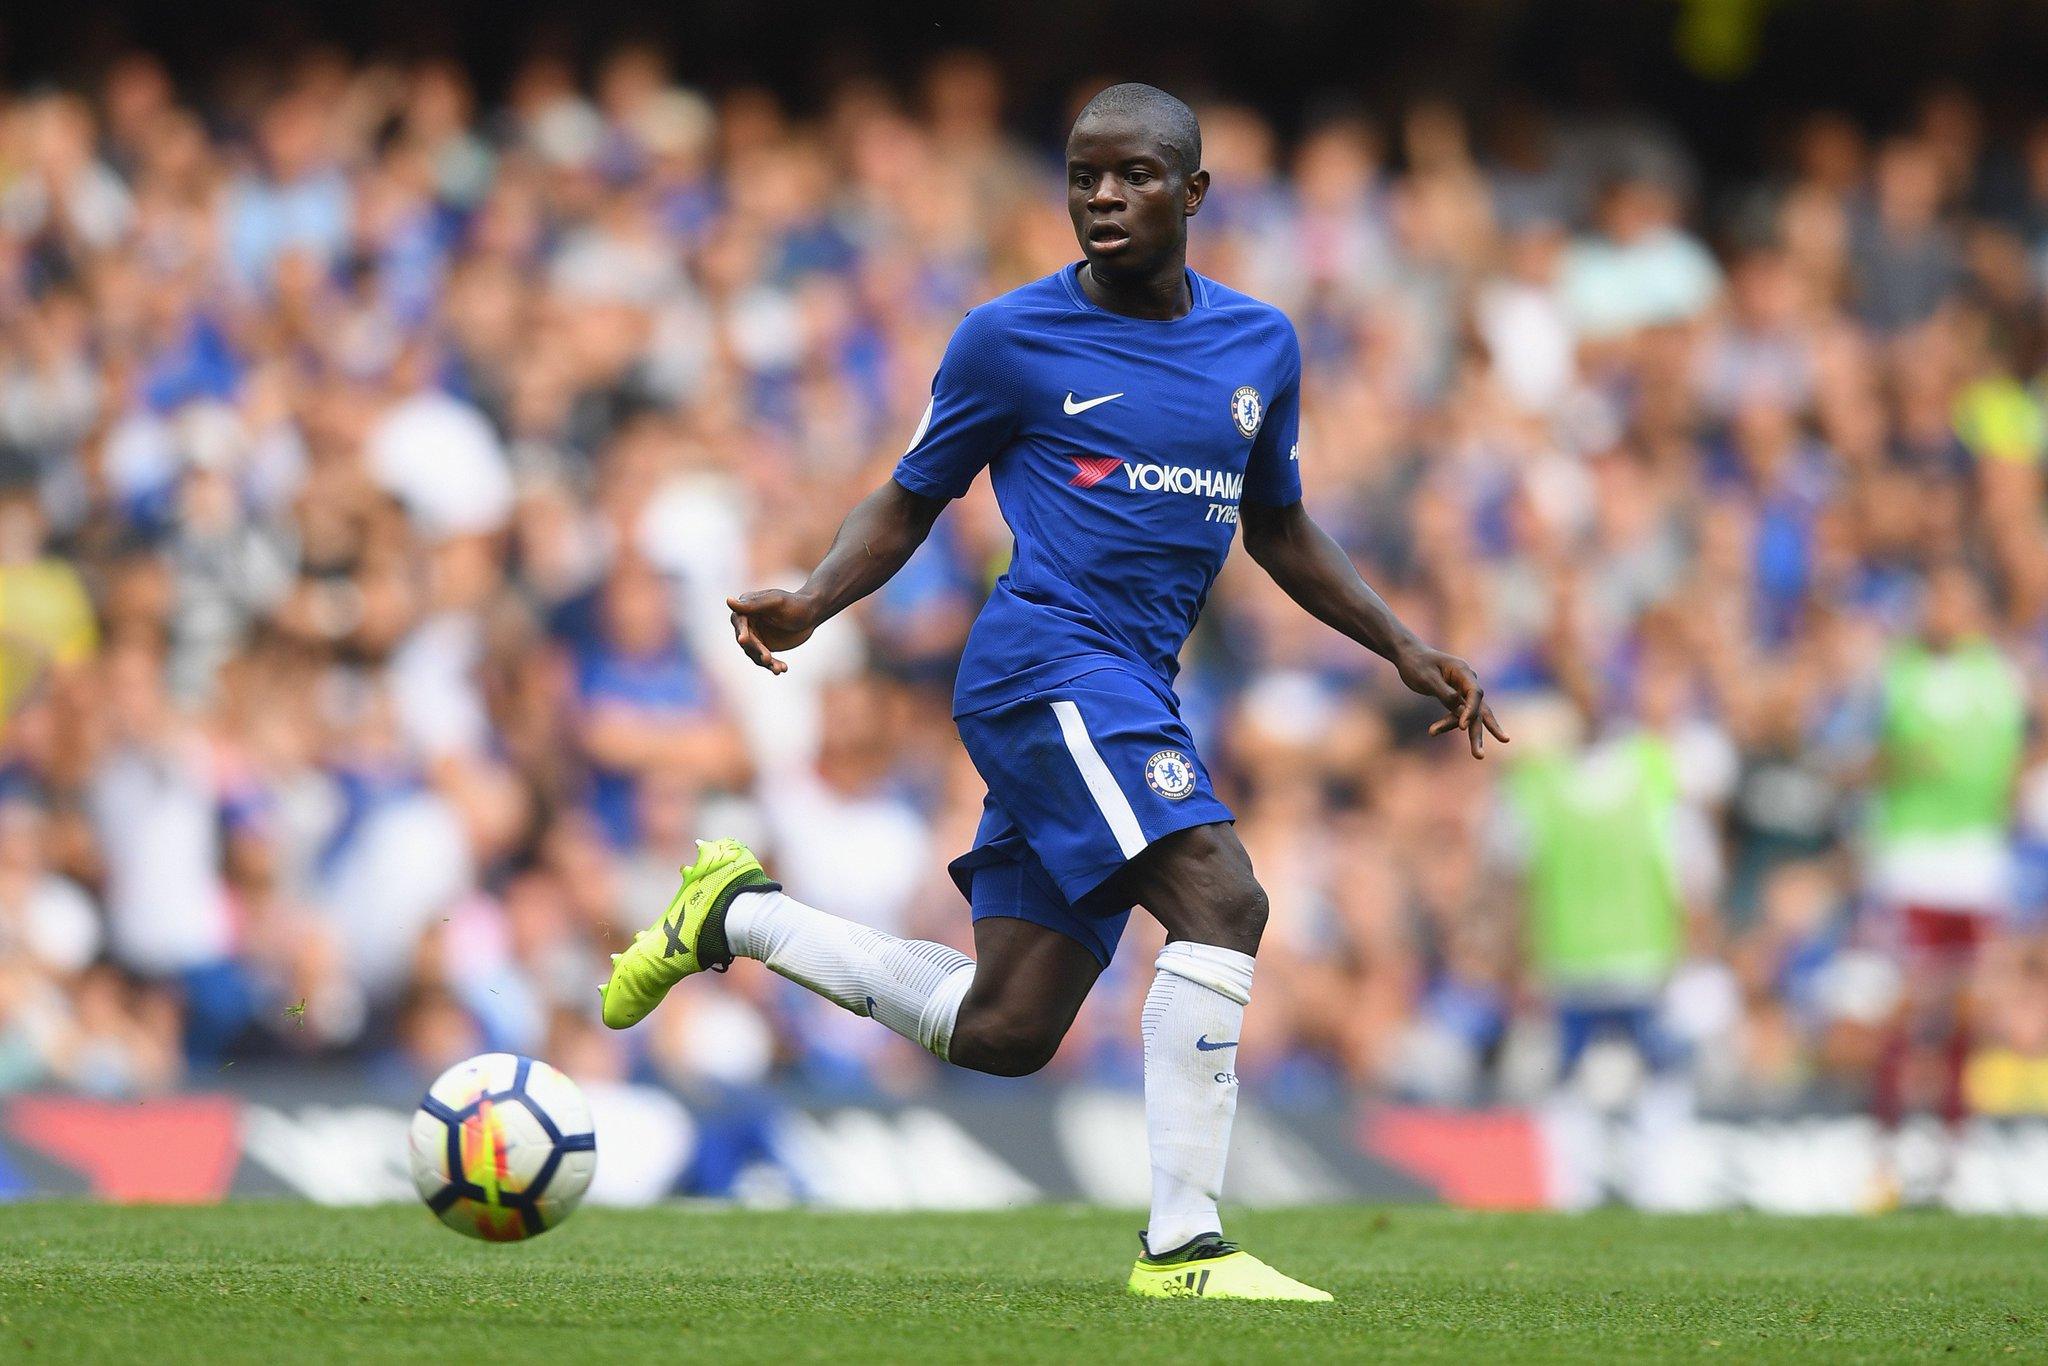 'N'Golo Kante is a big loss' - Conte.  Chelsea team news ➡️https://t.co/ylstKzPgpL https://t.co/1c7oZ5hjhJ